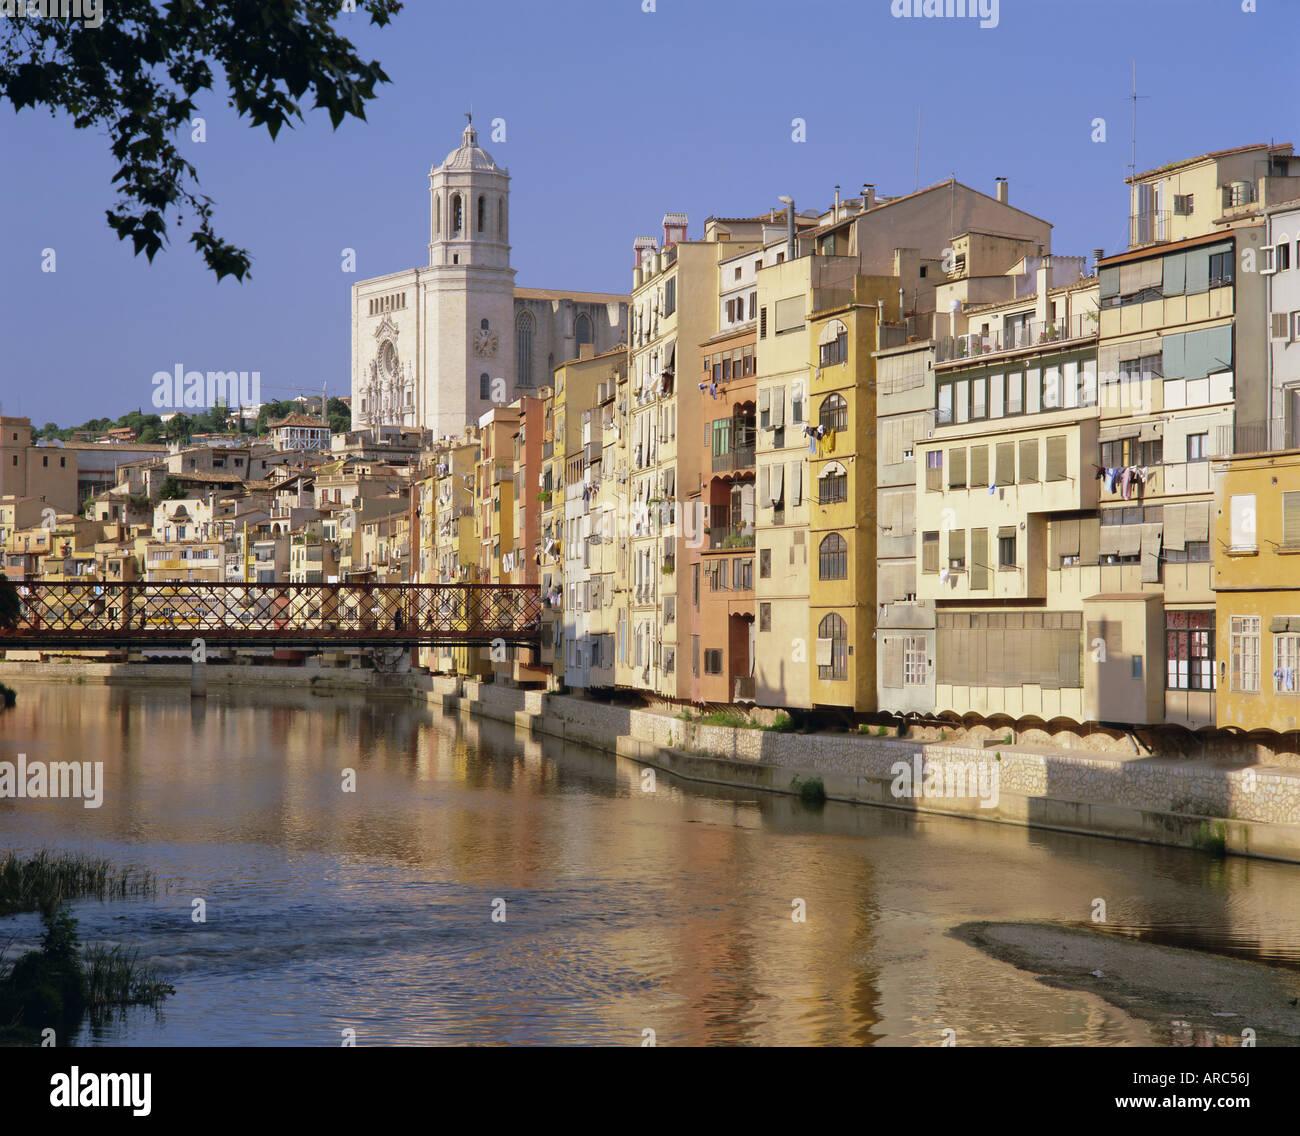 Case medievali sul fiume Onyar, Girona, Catalogna (Catalogna) (Cataluña), Spagna, Europa Immagini Stock